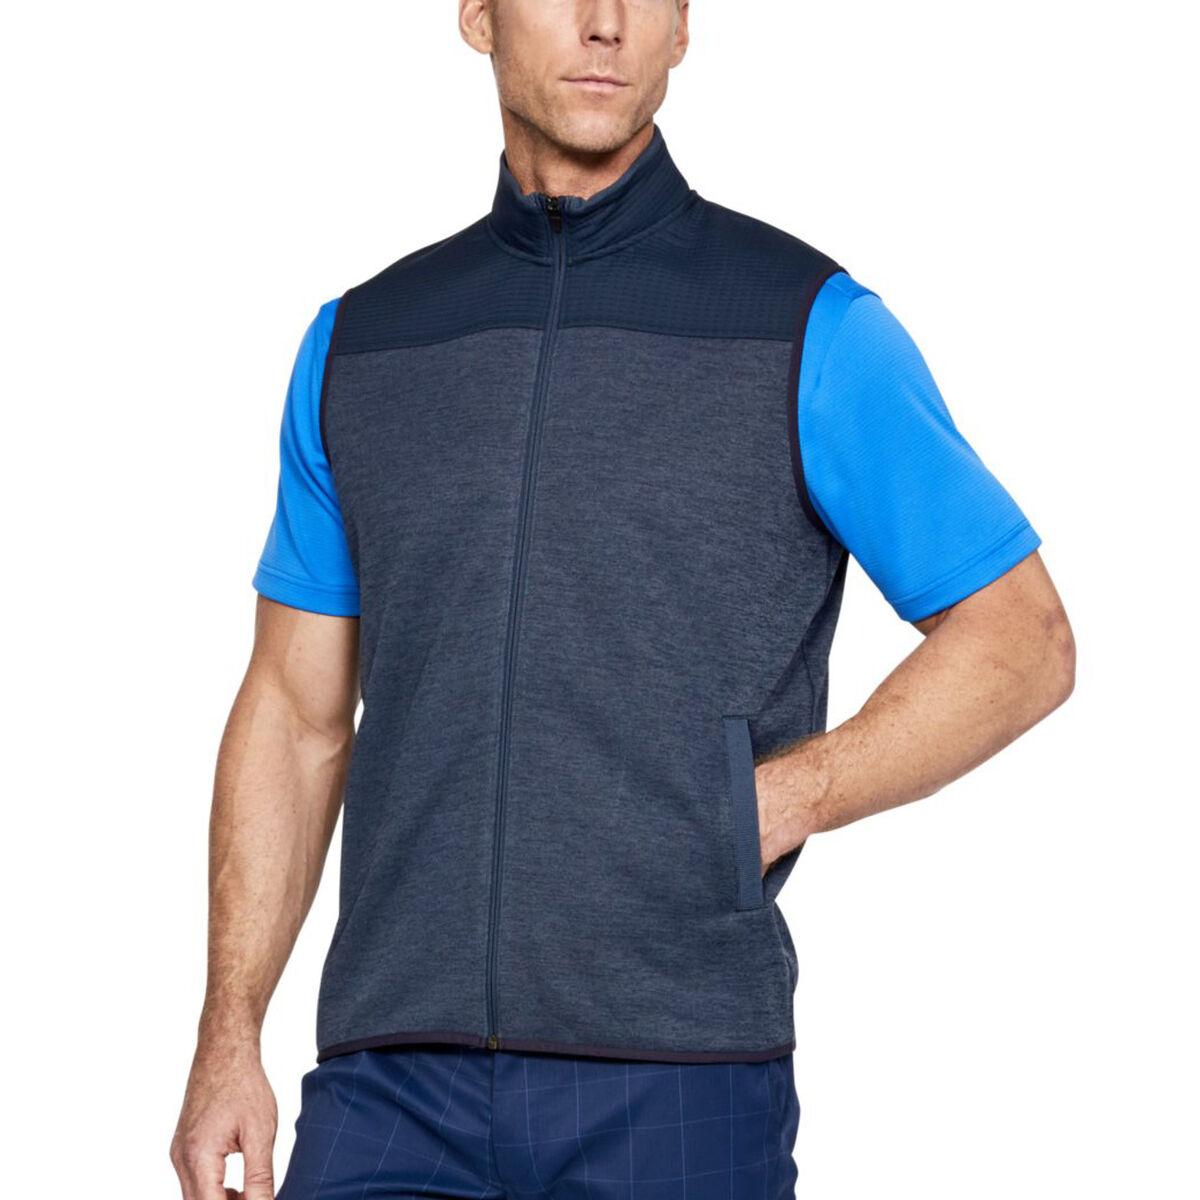 267ab3fe18 Under Armour SweaterFleece Full Zip Vest